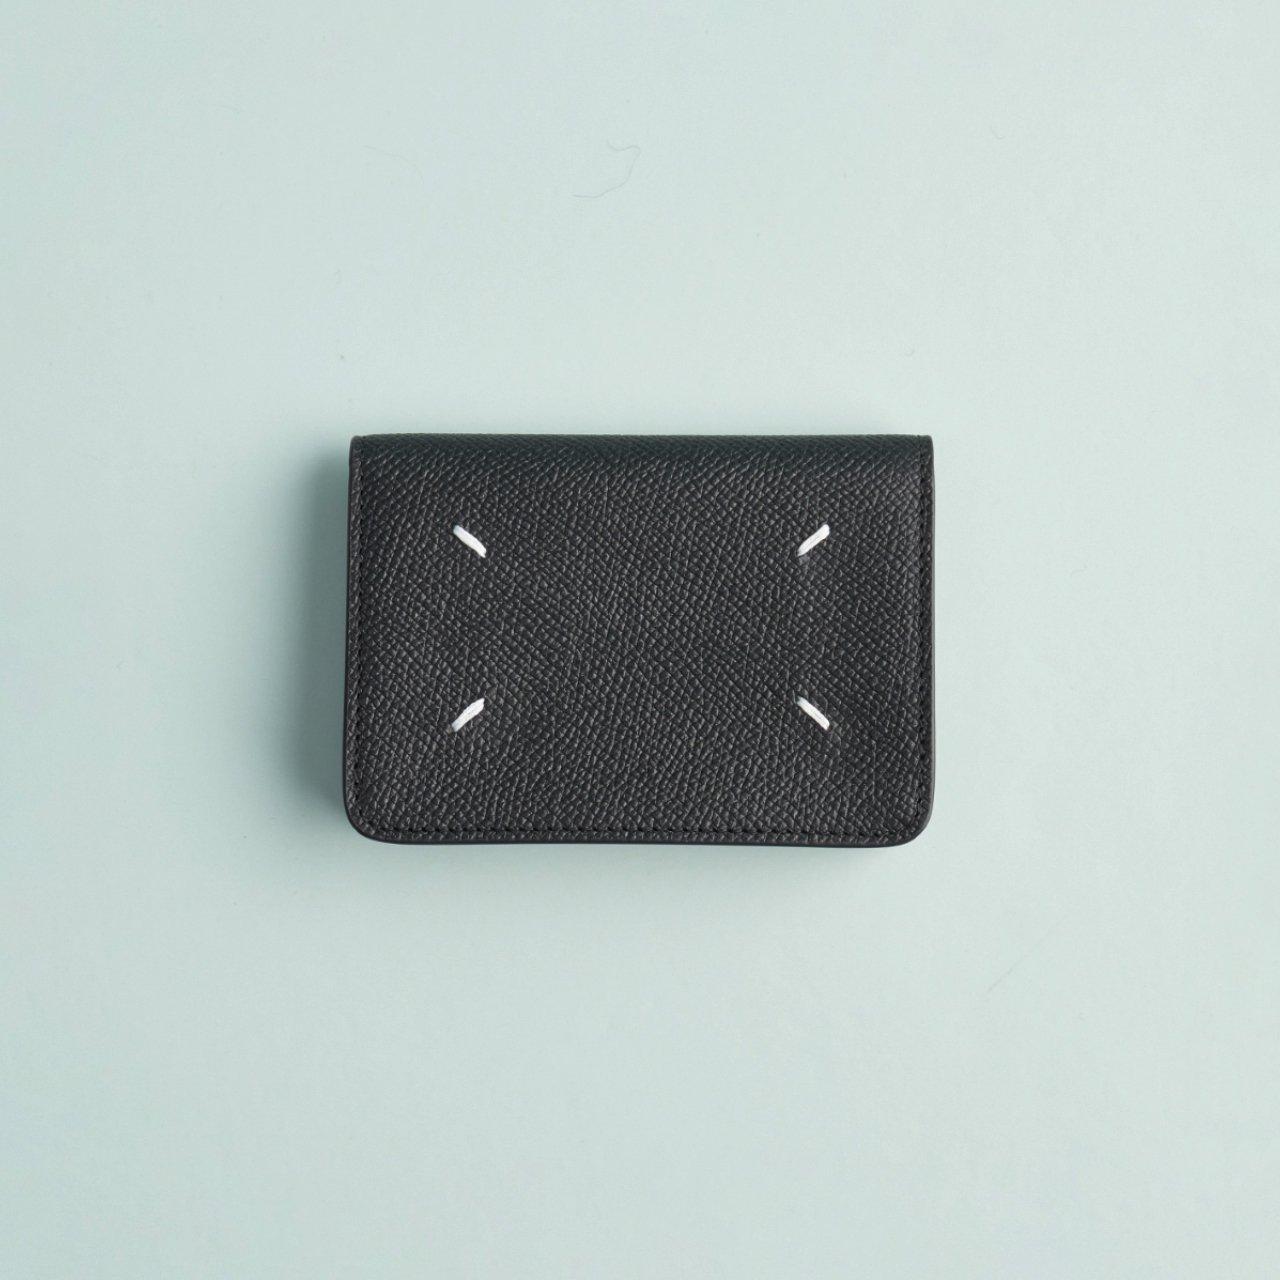 Maison Margiela PARIS <BR>カードケース<BR>ブラック